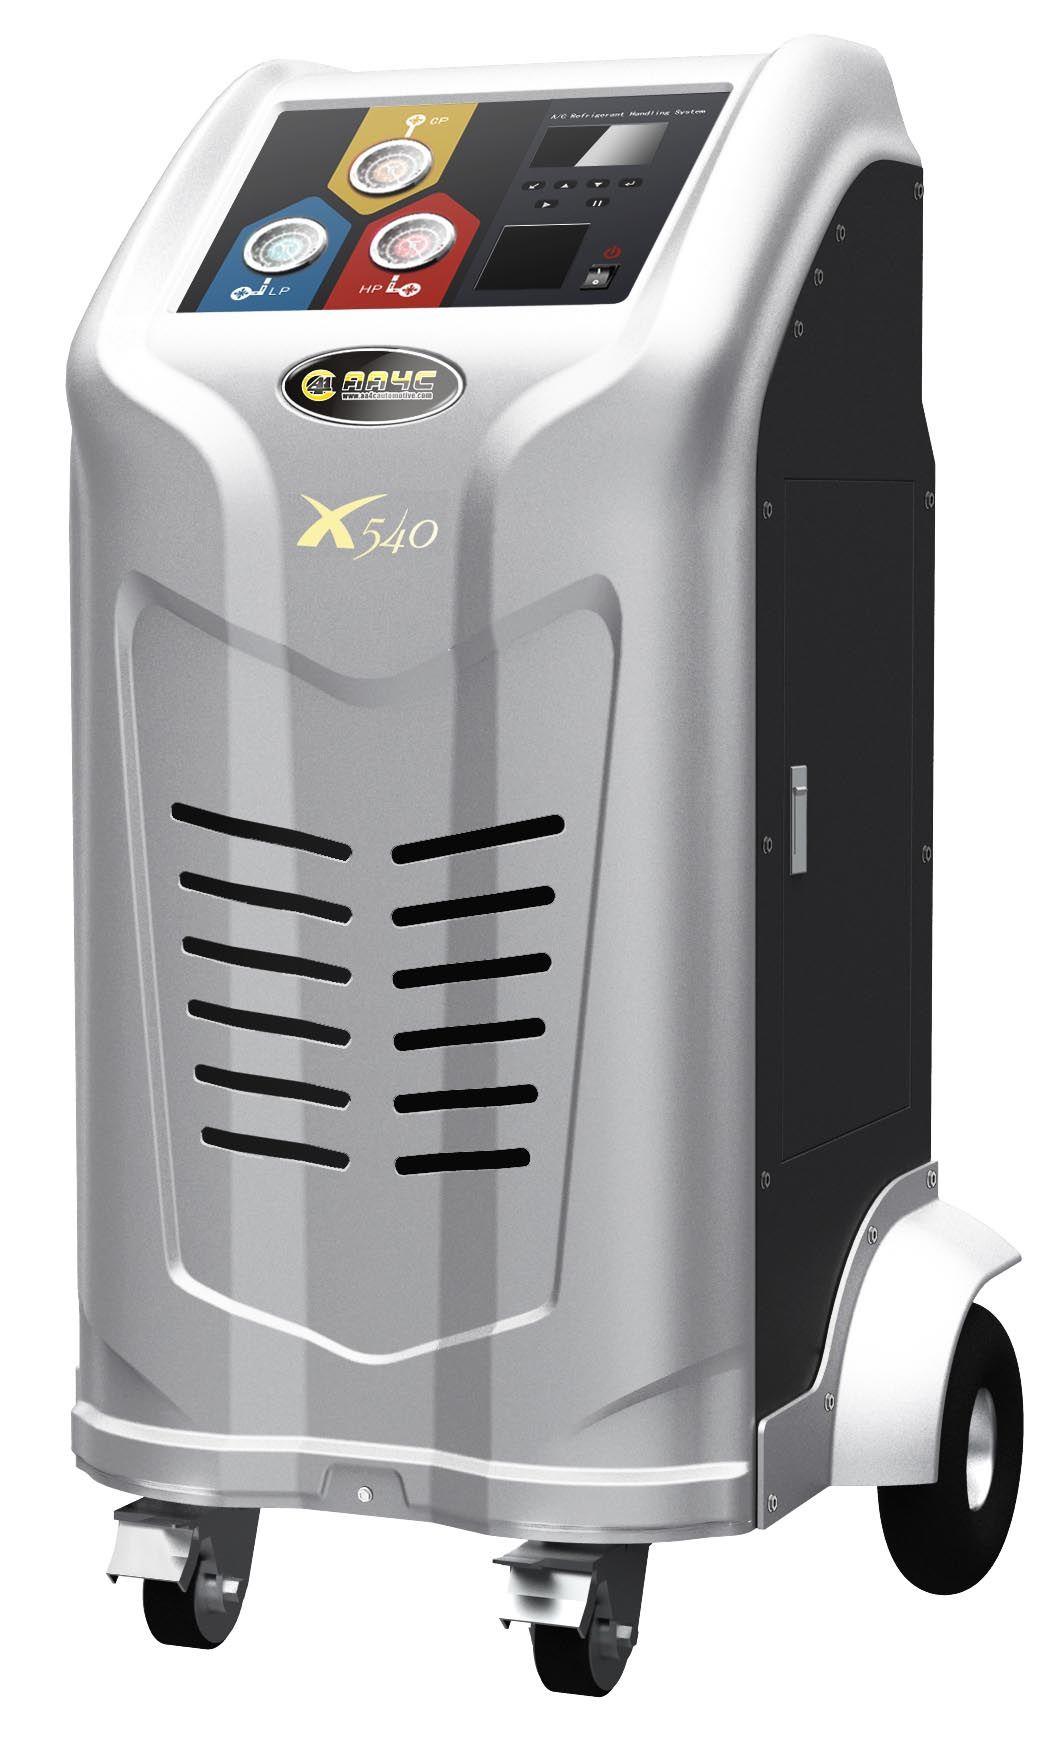 Car Air Conditioning Handling System Car, Handle